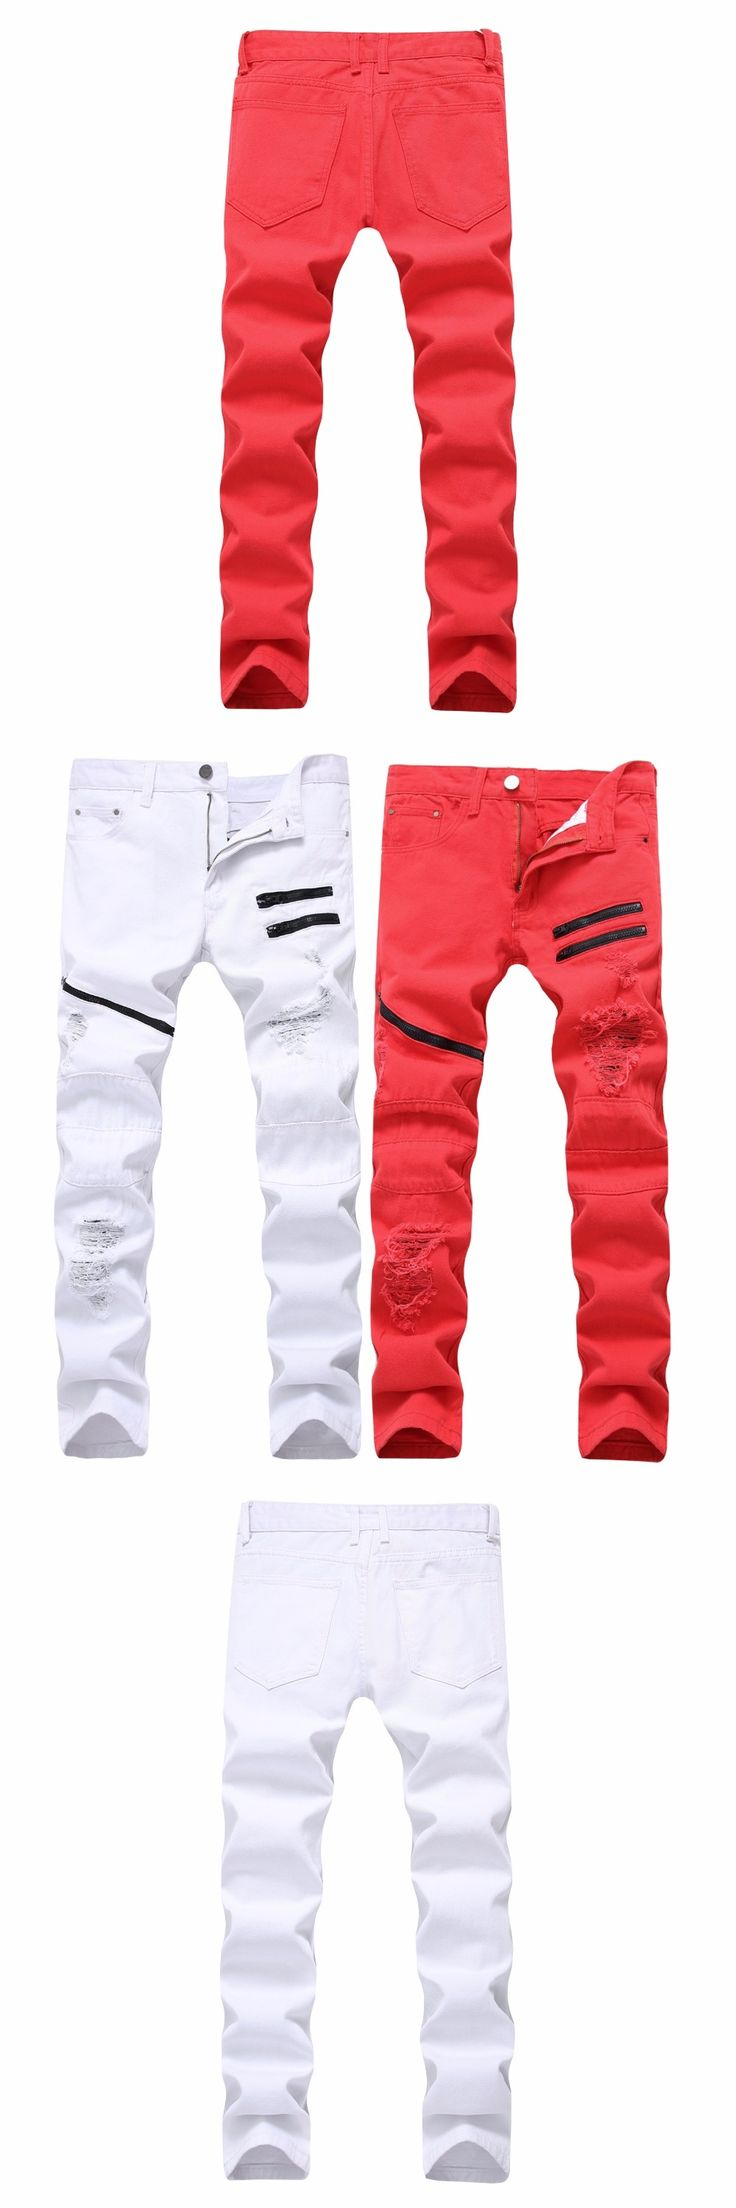 2017 Brand Jeans Men Casual Straight Denim Men's Fashion Jeans Slim Denim overall Brands Jean homme Men Hip-Hop Biker Jeans